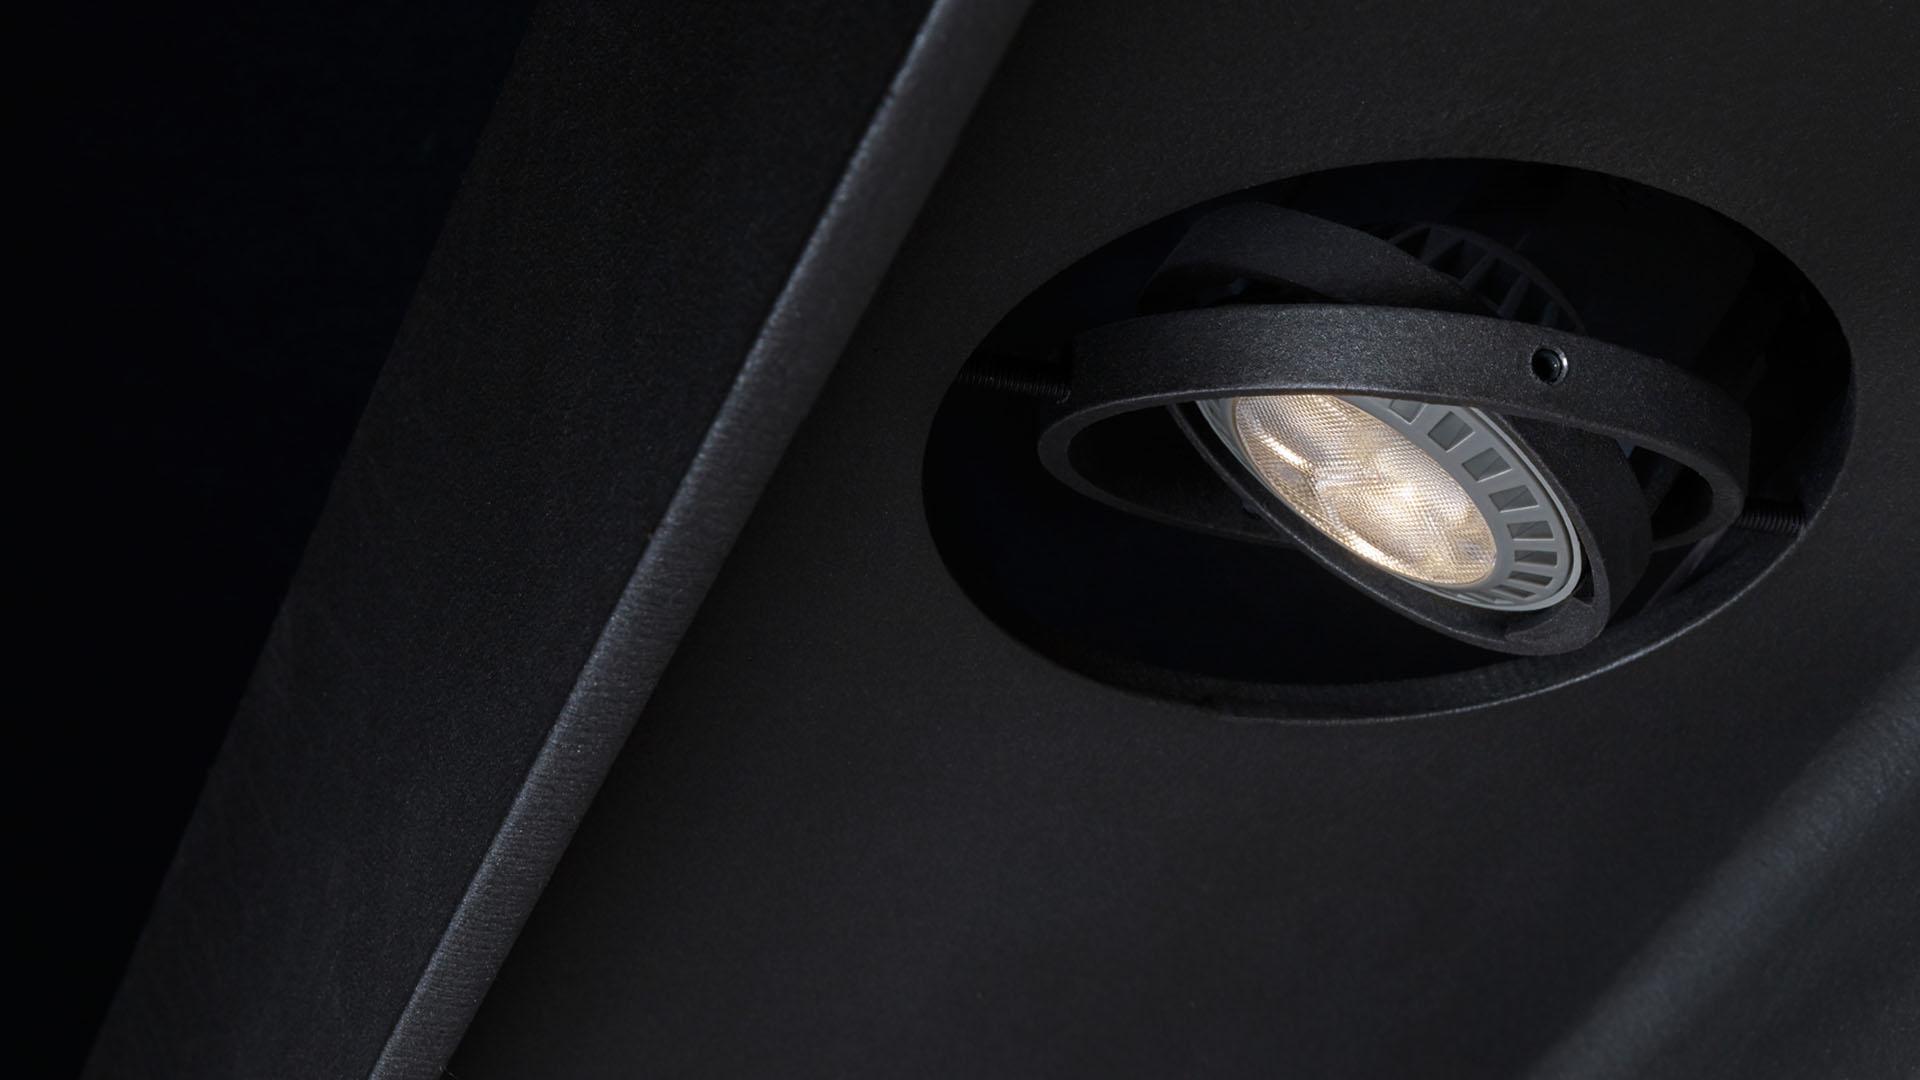 DITZ_M10 LICHT_ LED